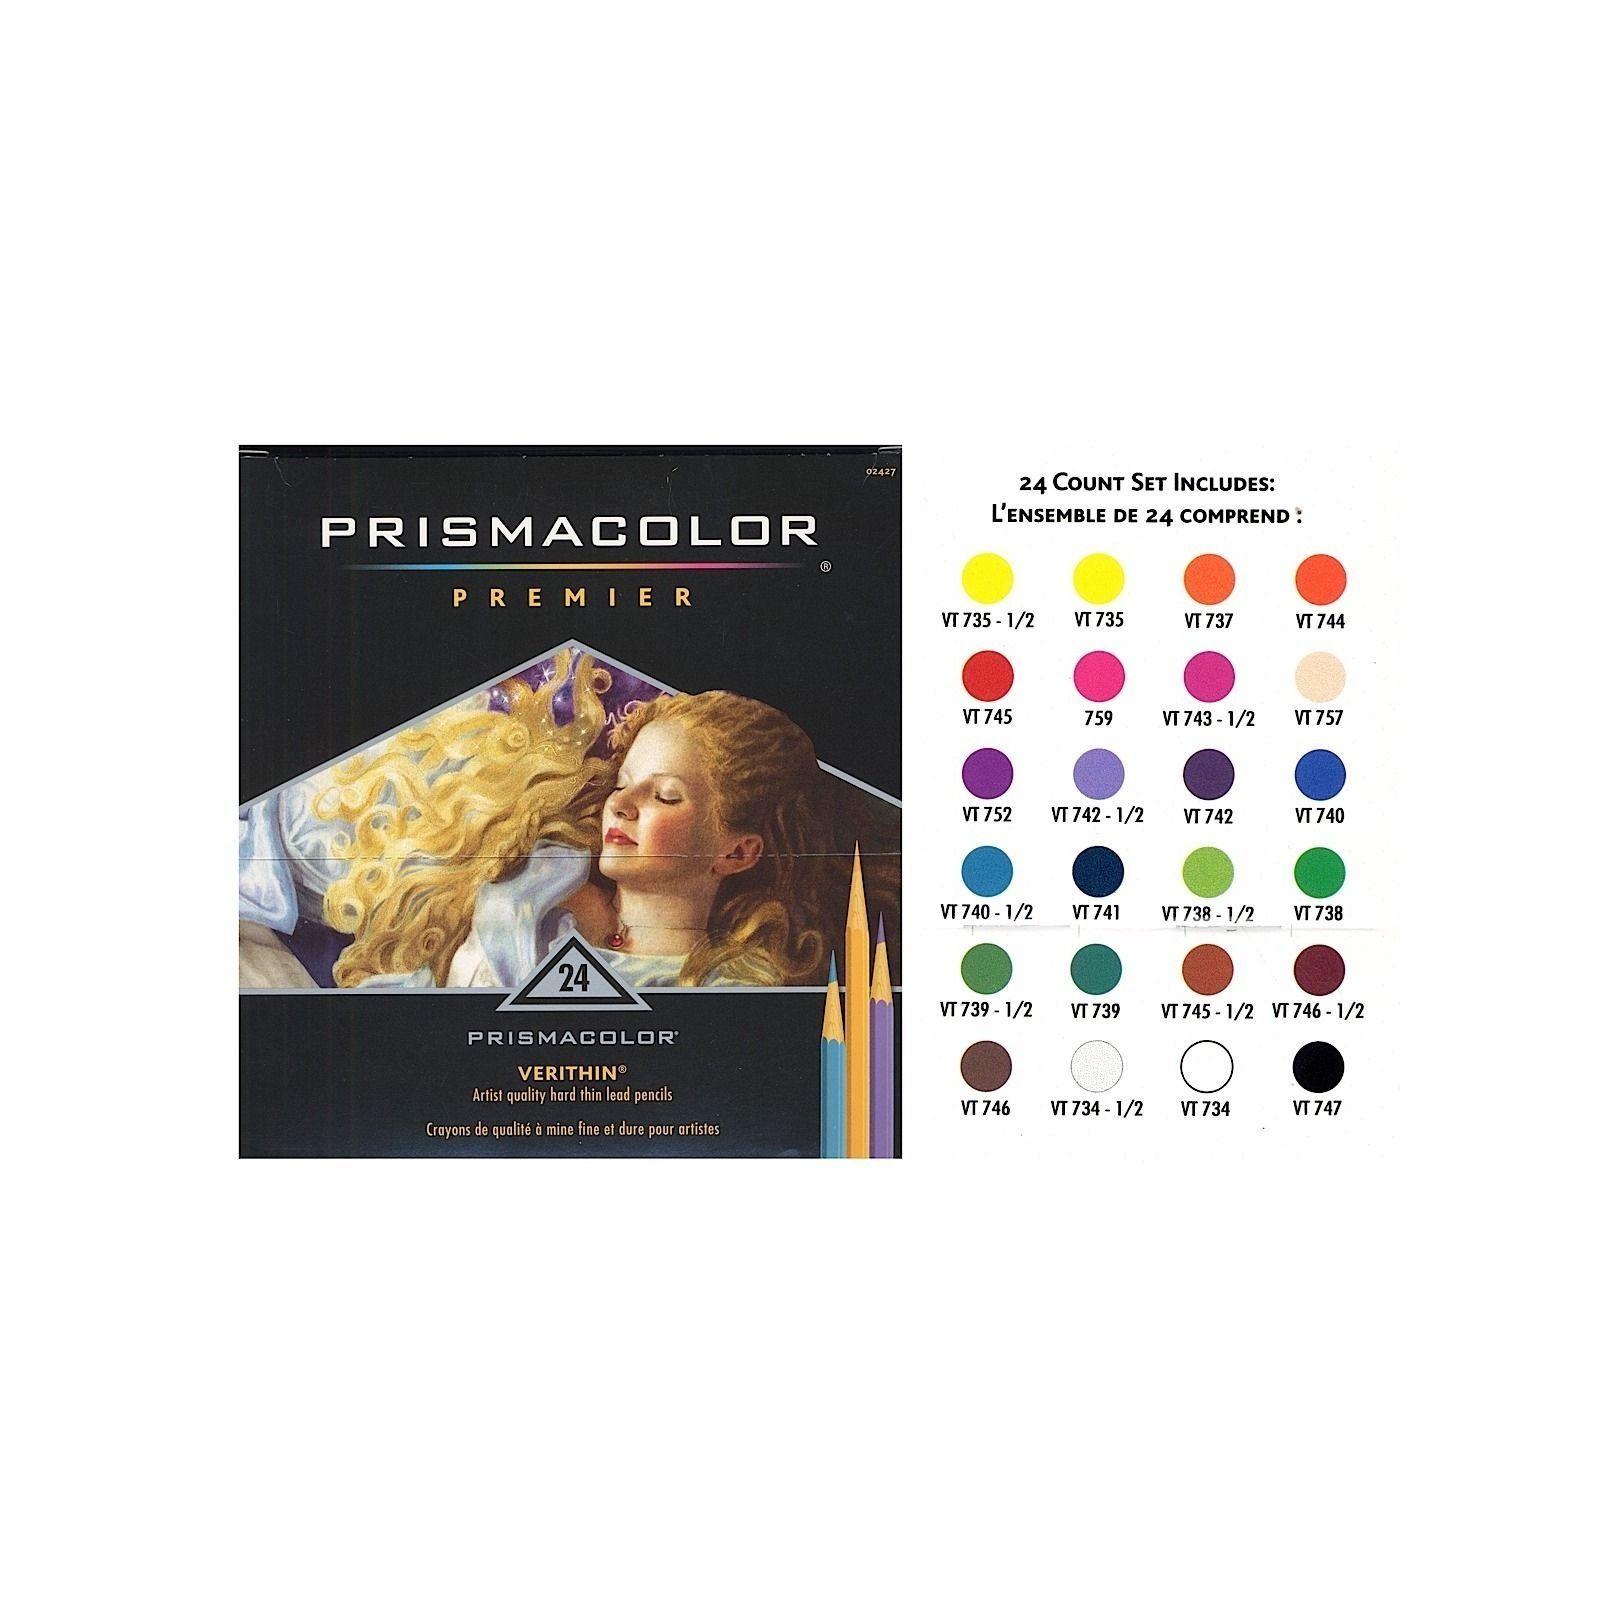 Prismacolor verithin colored pencil sets set of 36 by prismacolor prismacolor verithin colored pencil sets nvjuhfo Choice Image